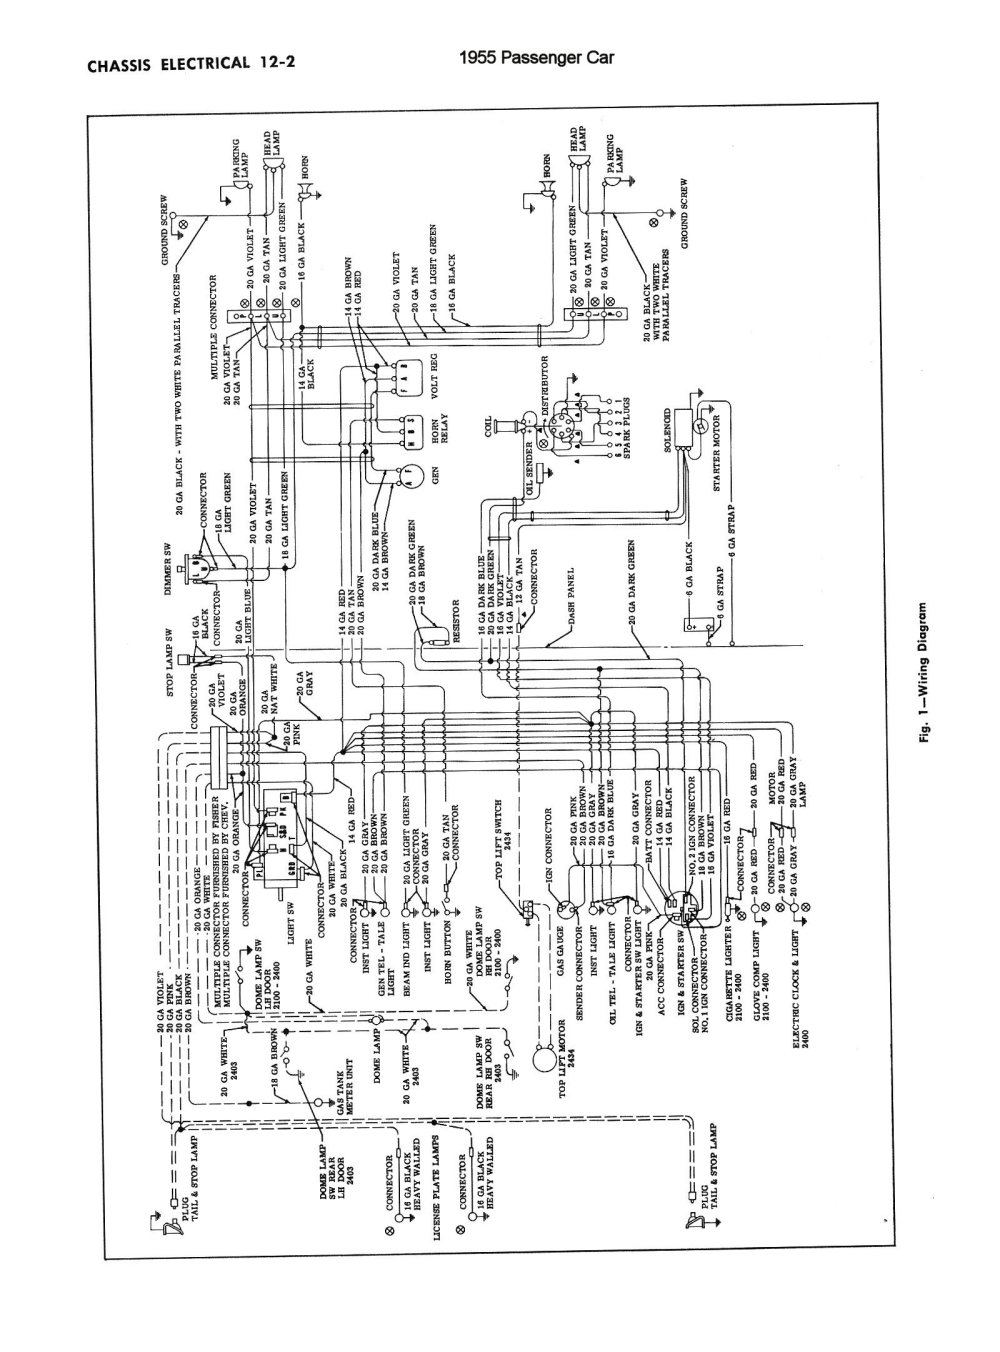 medium resolution of chevy wiring diagrams1955 car chassis electrical 1955 car chassis electrical